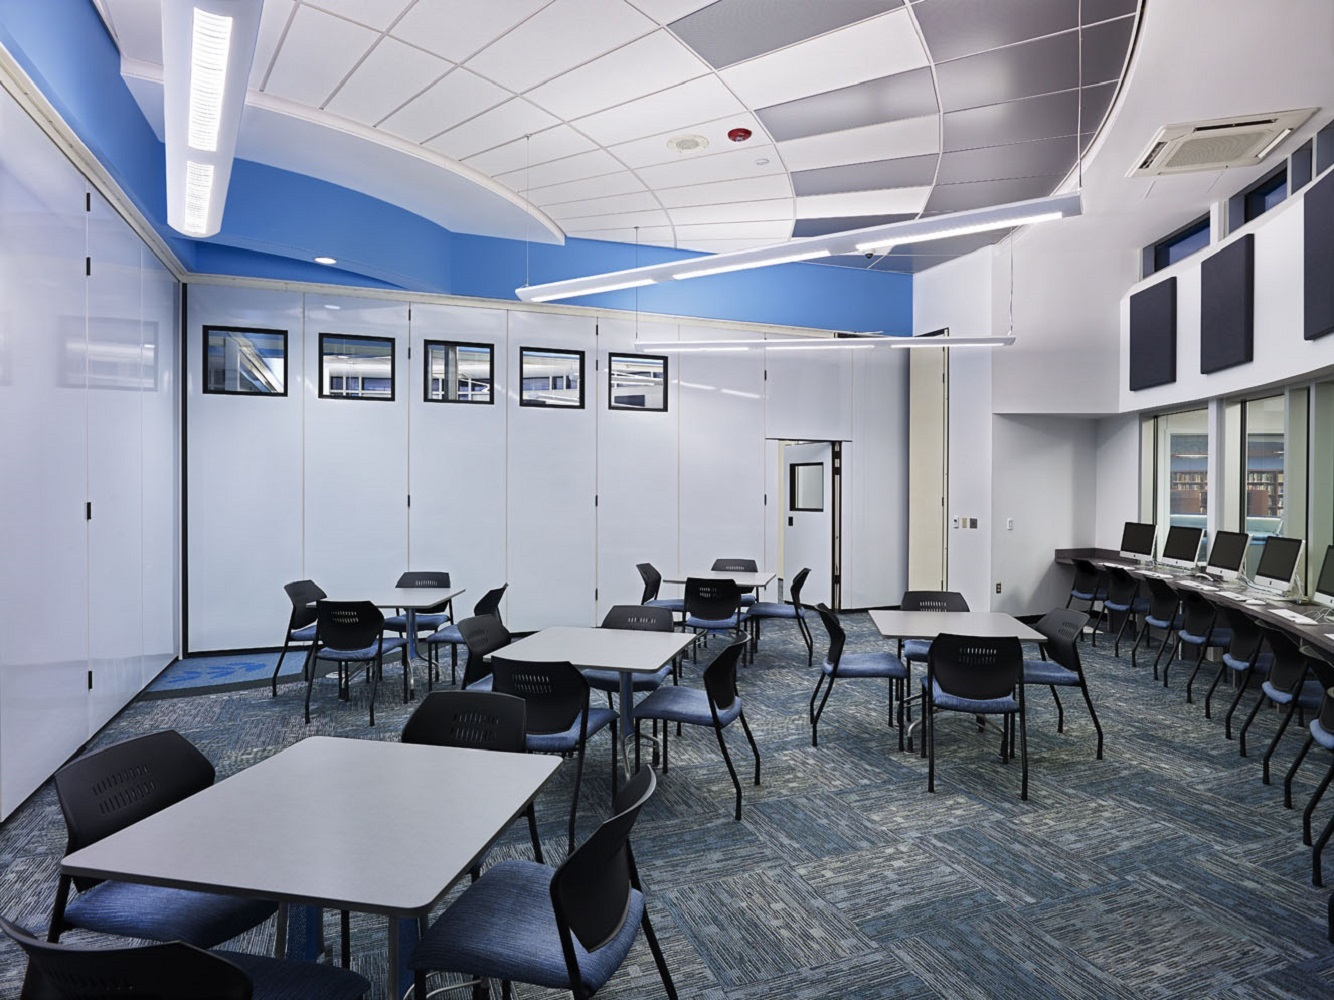 Interior - Lounge Area.jpg